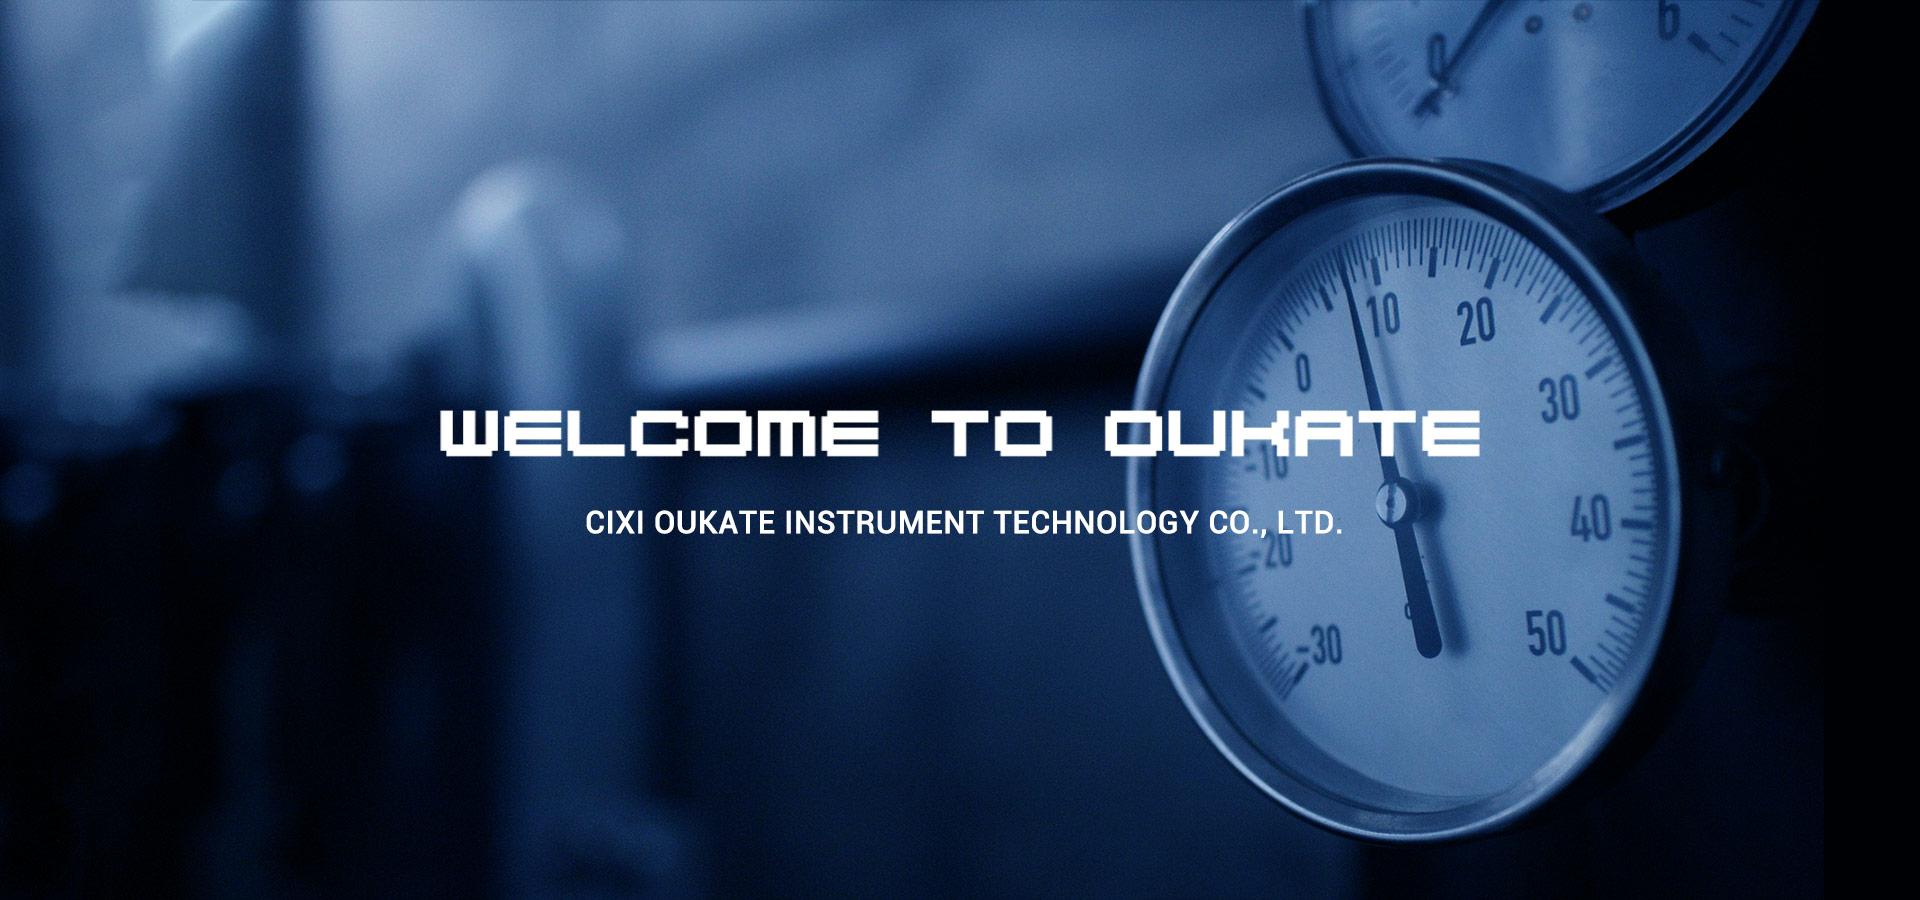 Cixi Oukate Instrument Technology Co.,Ltd.